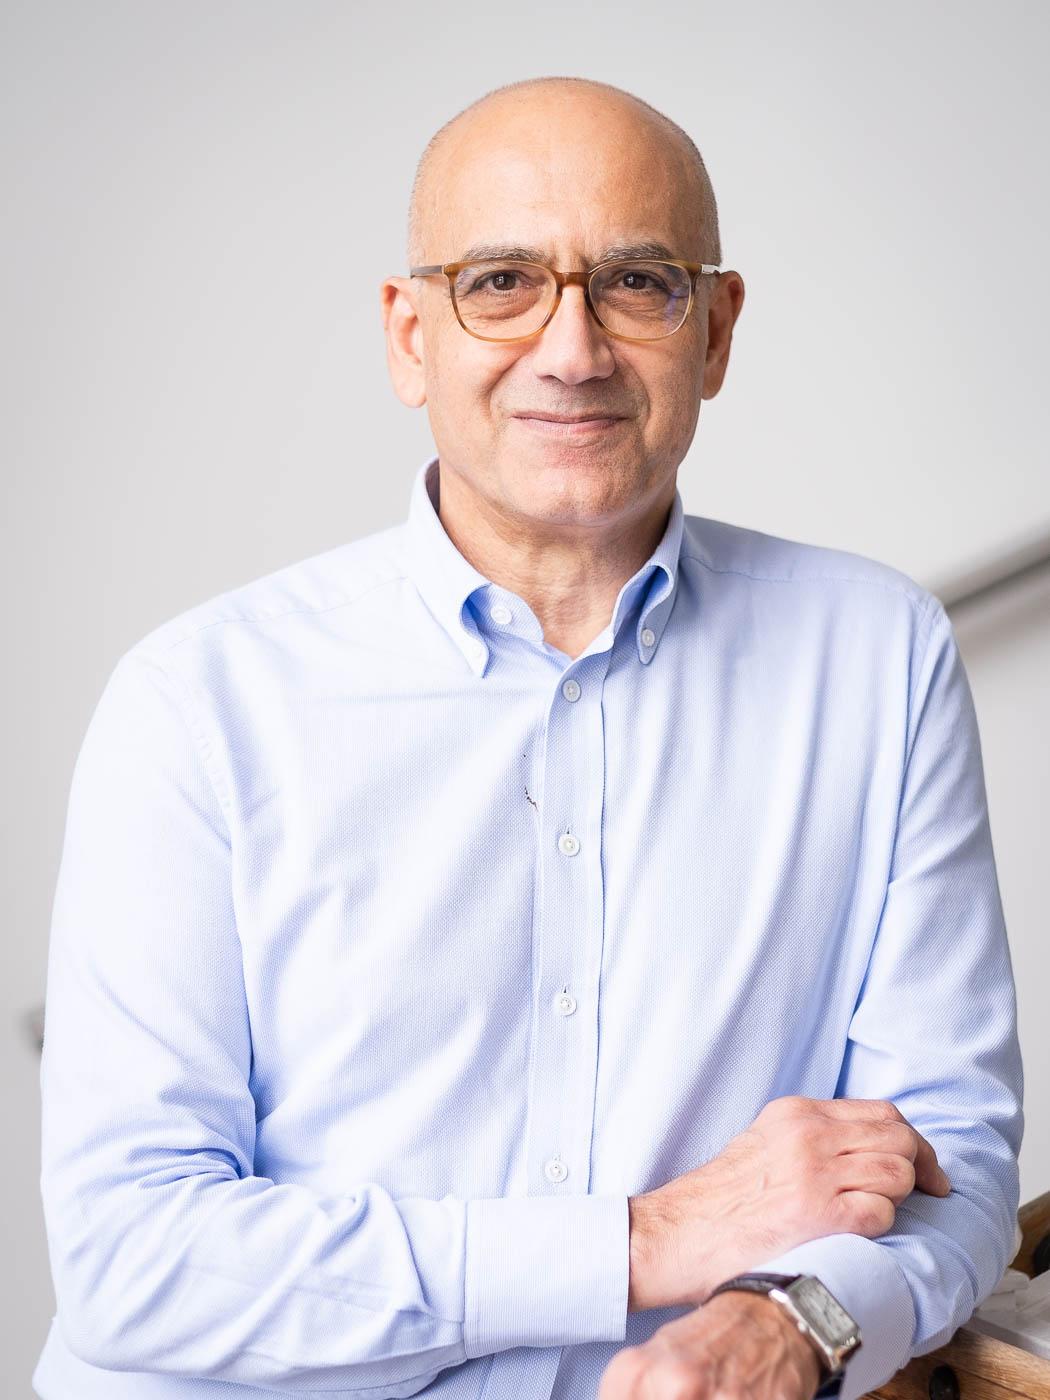 Dr. Gerard Mertikian